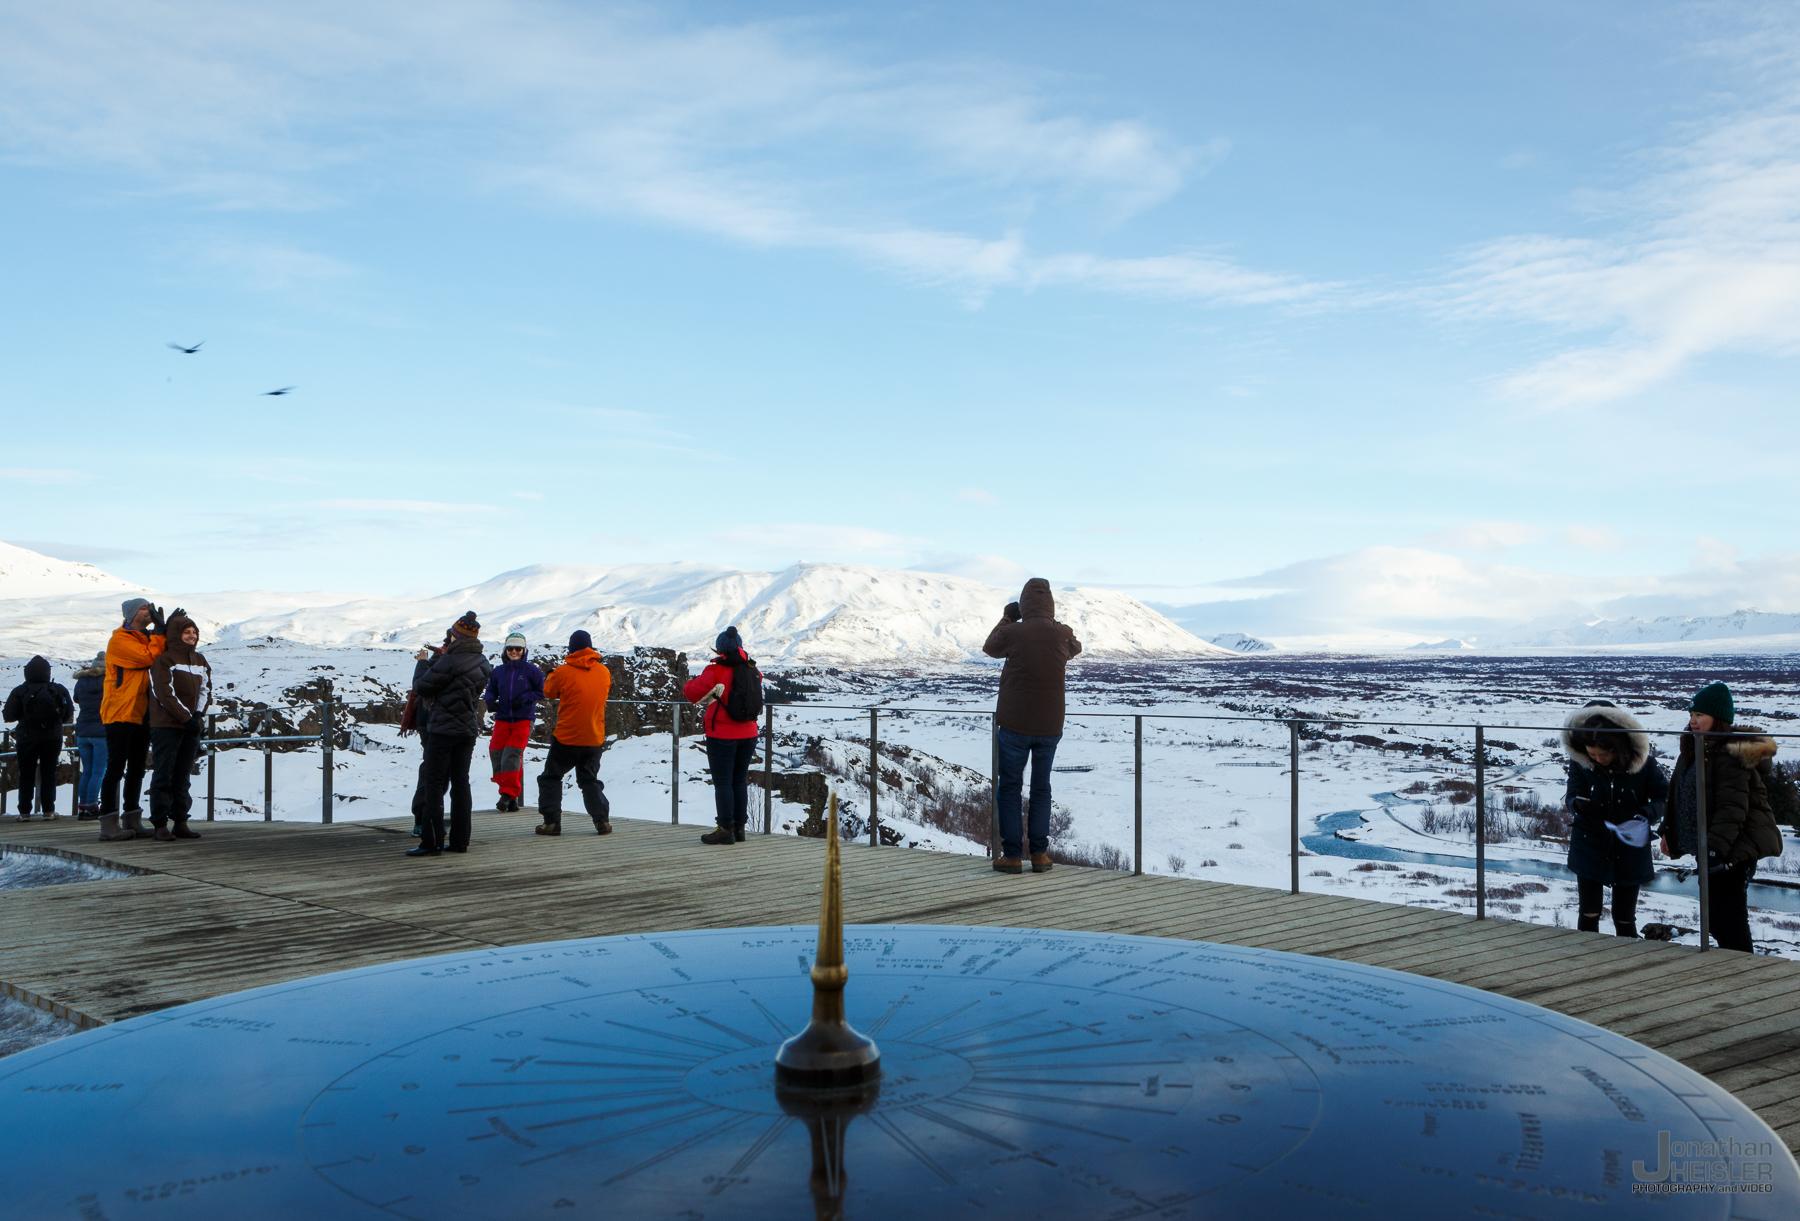 Iceland Winter Photos_  Jonathan Heisler __  02292016 _ 004.jpg